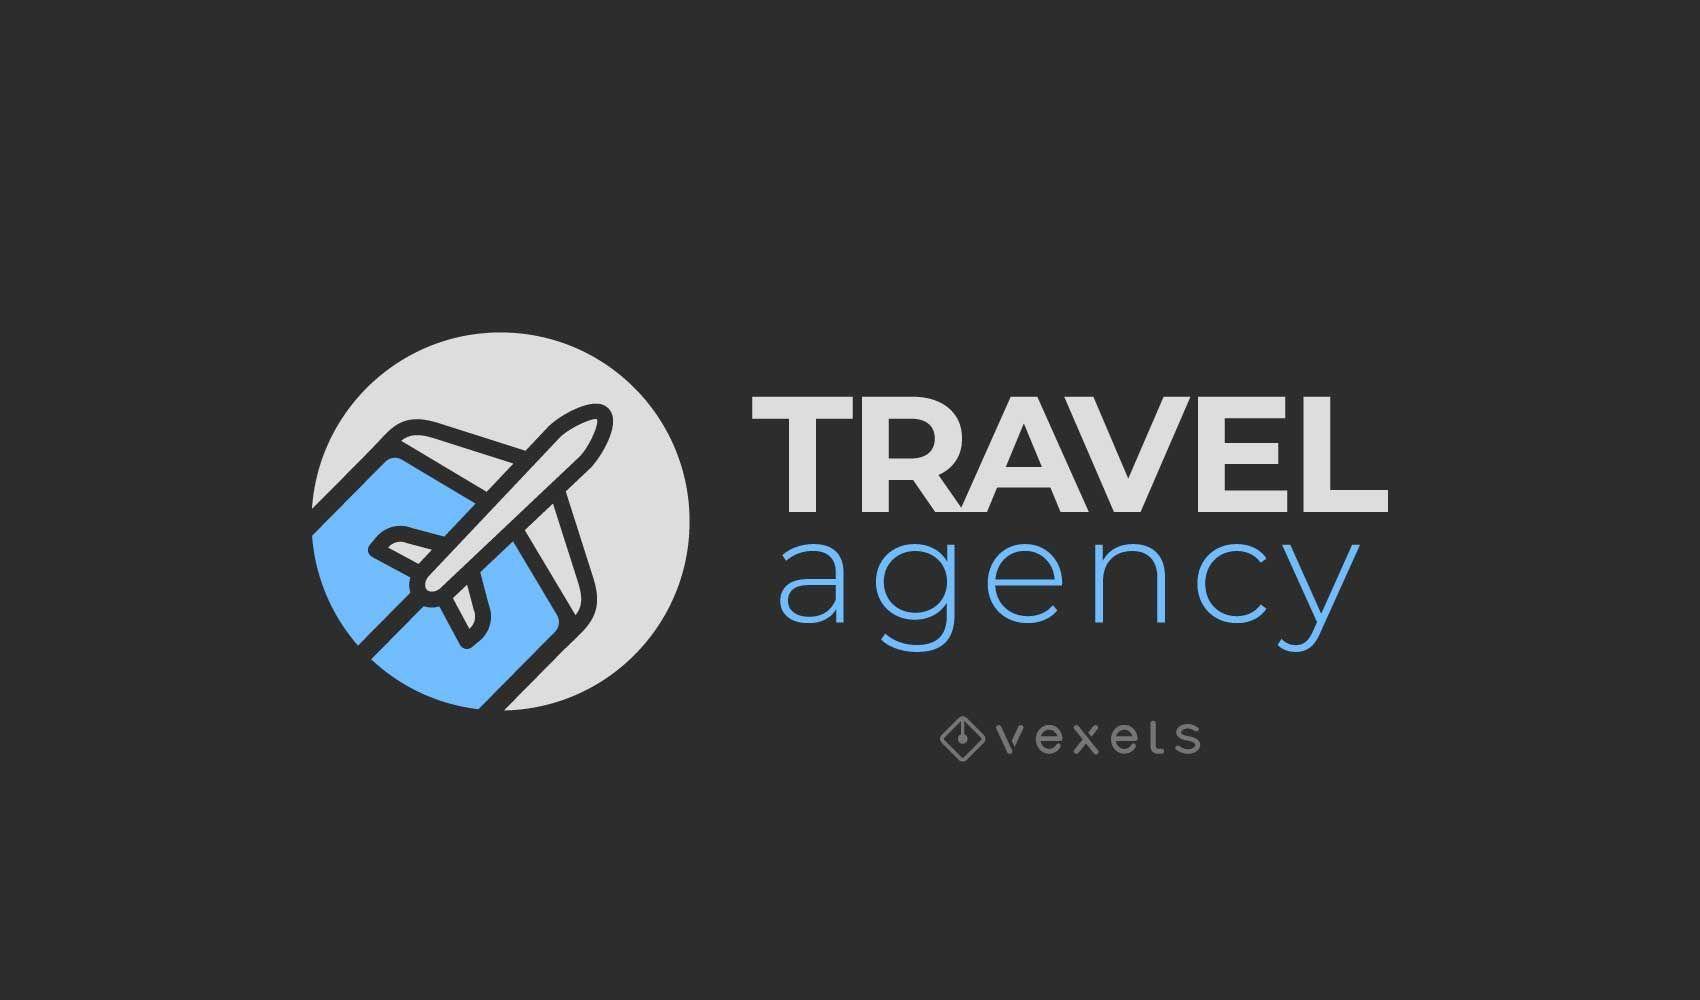 Design des Reisebüro-Logos